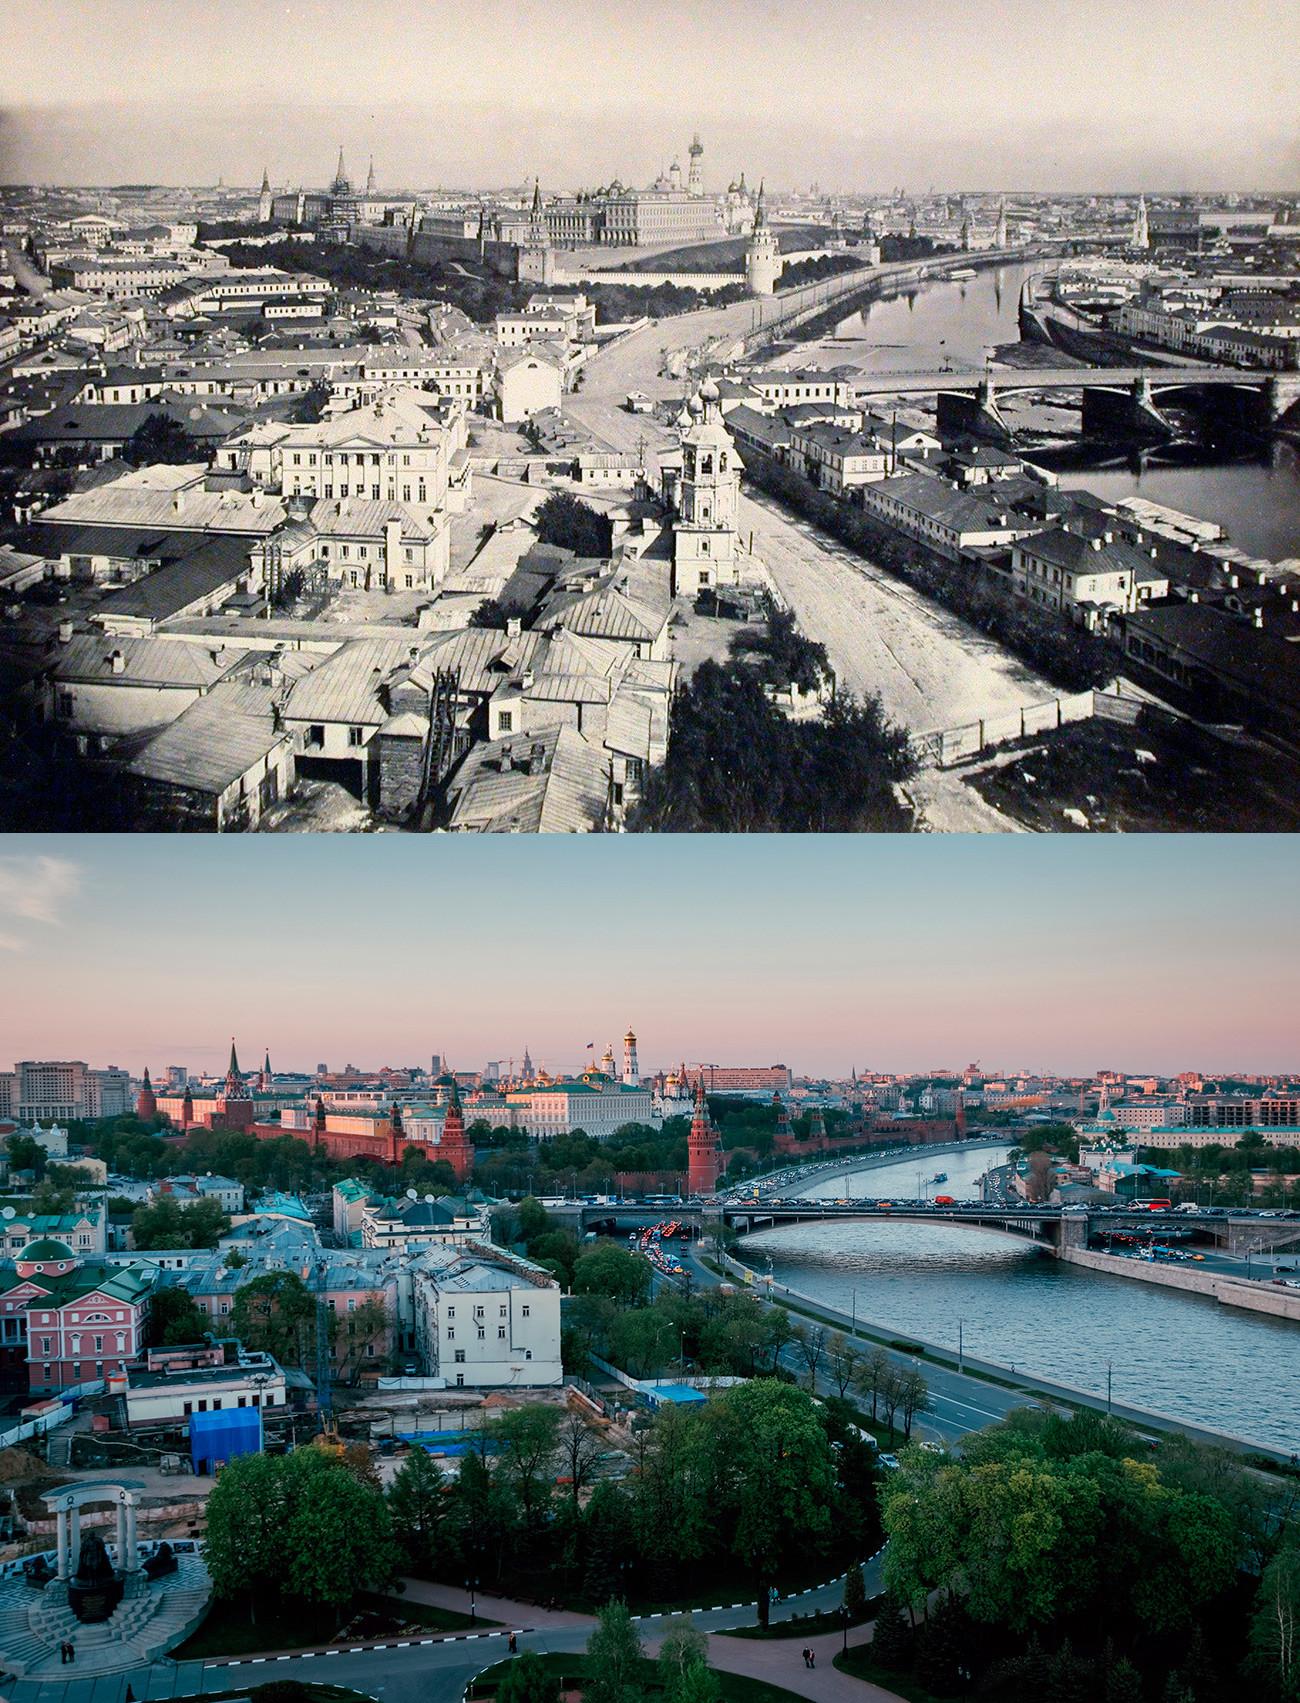 The Kremlin